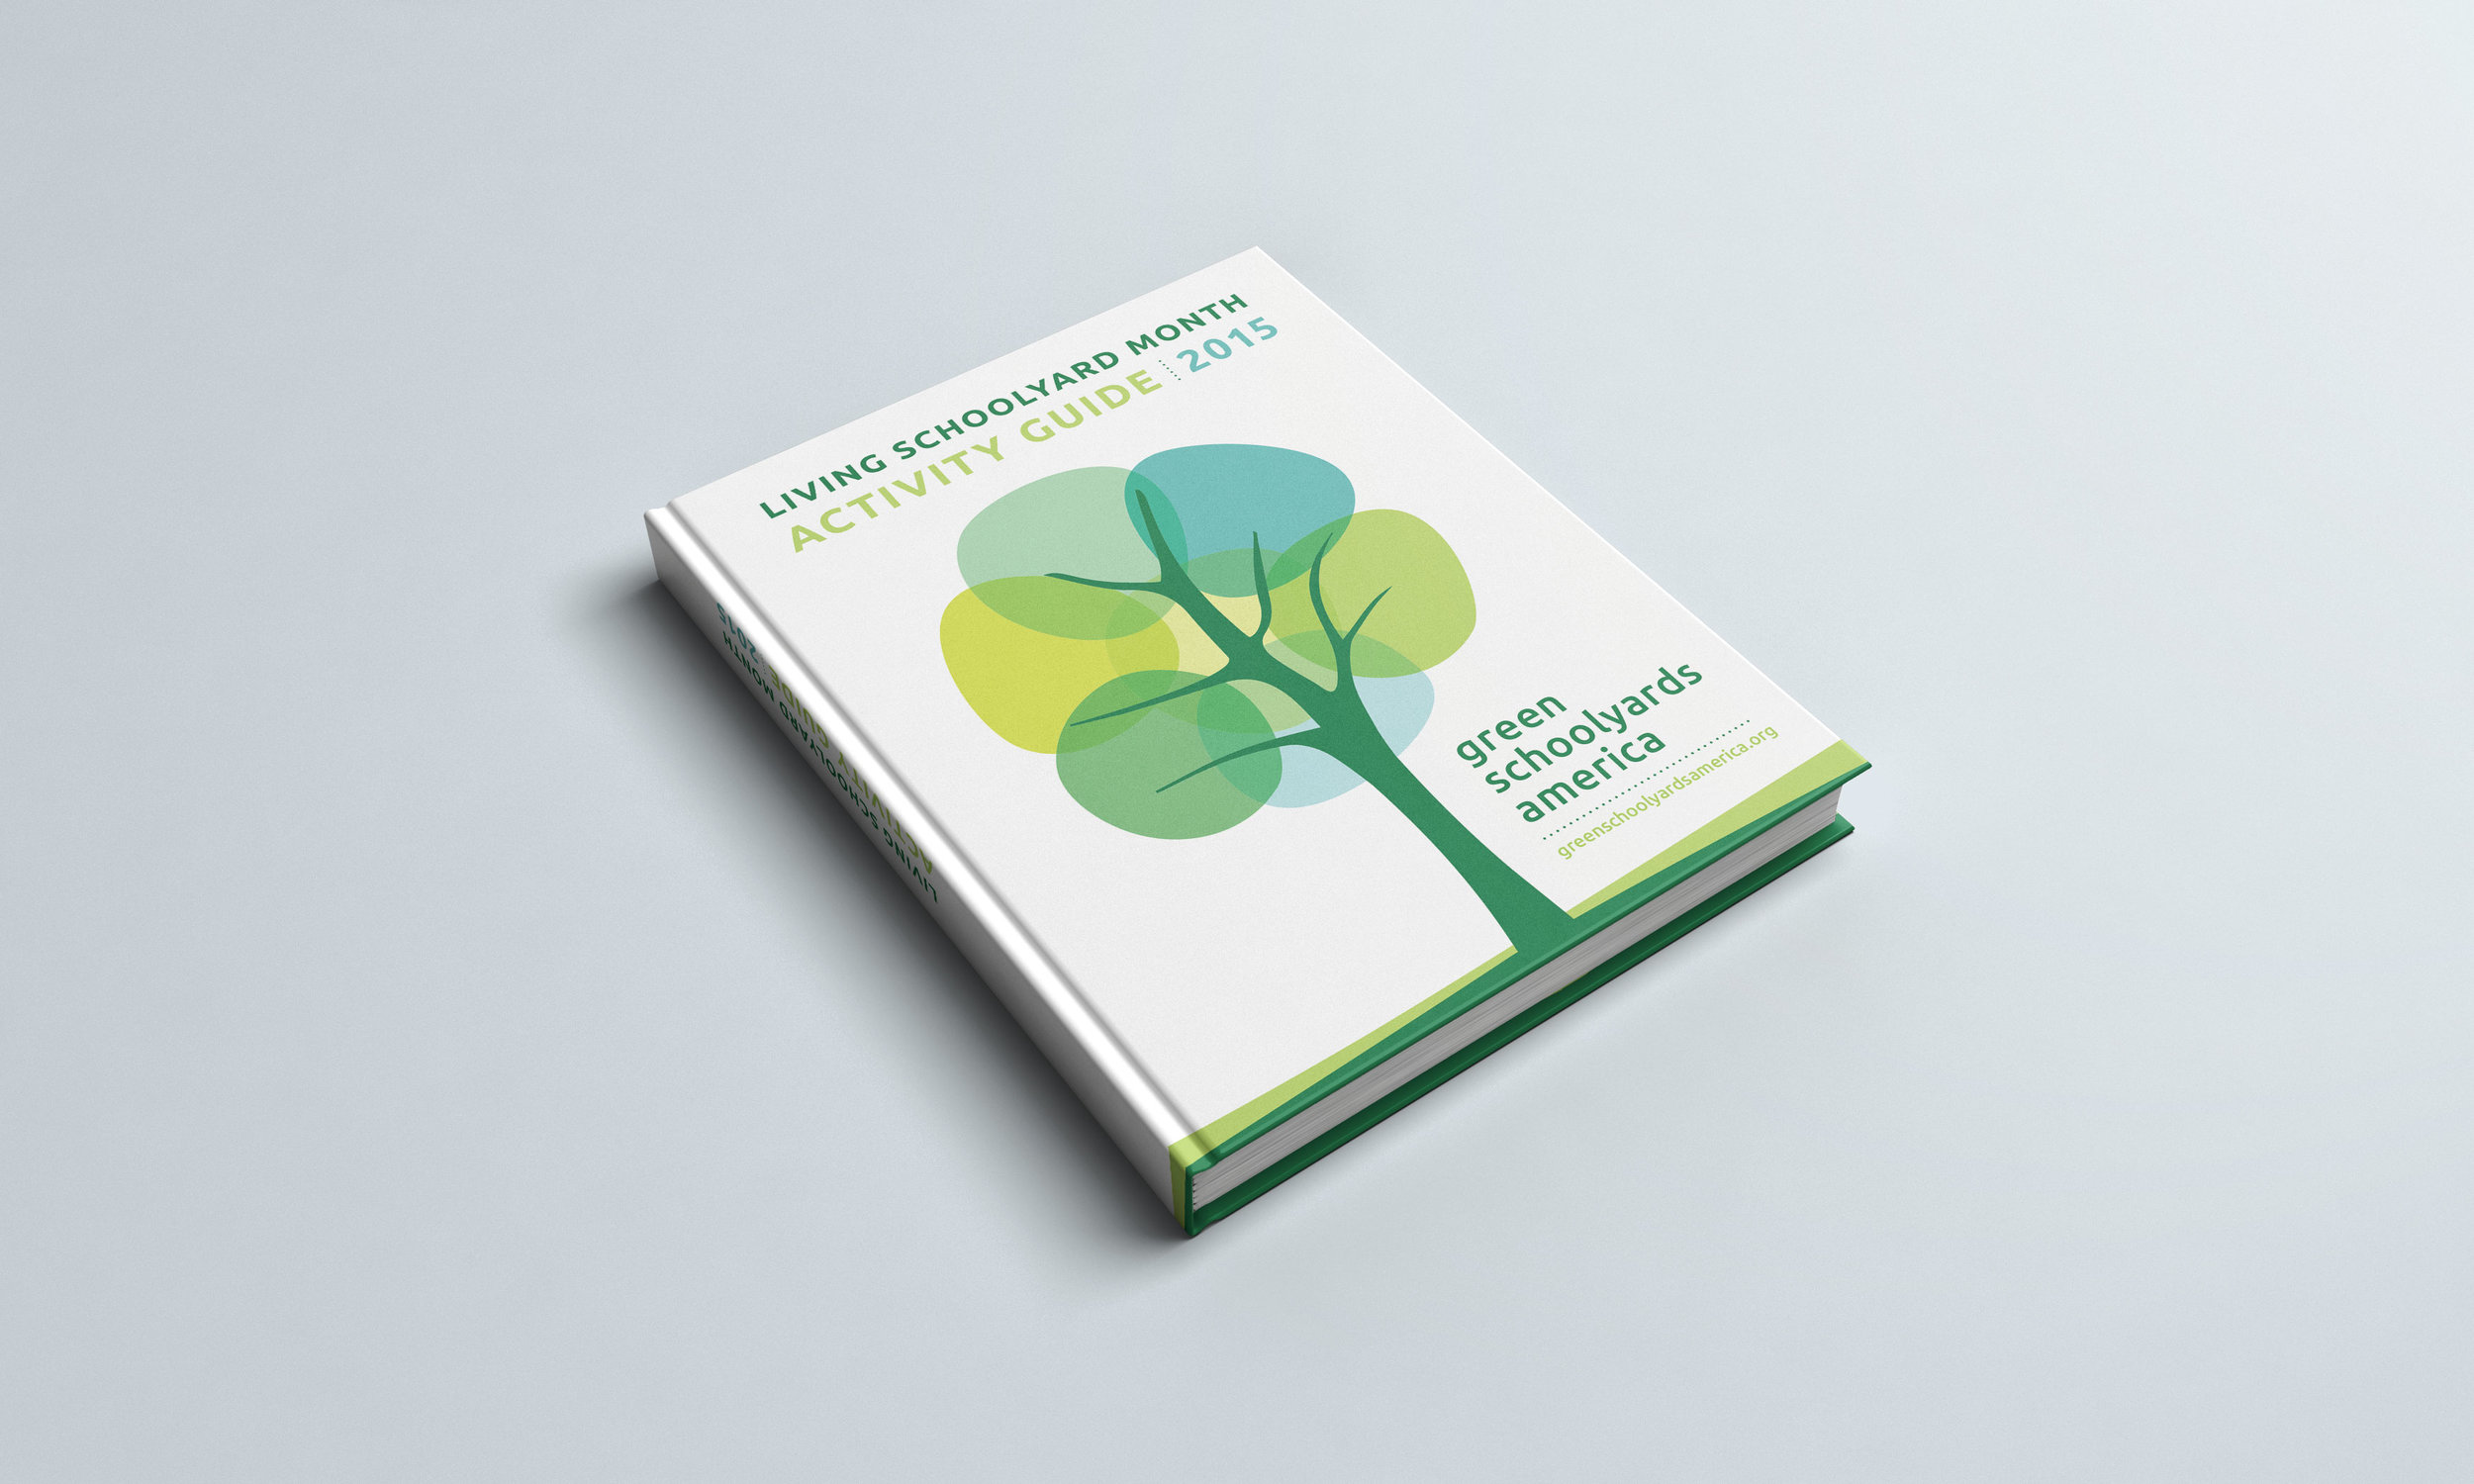 Green Schoolyards America Publication